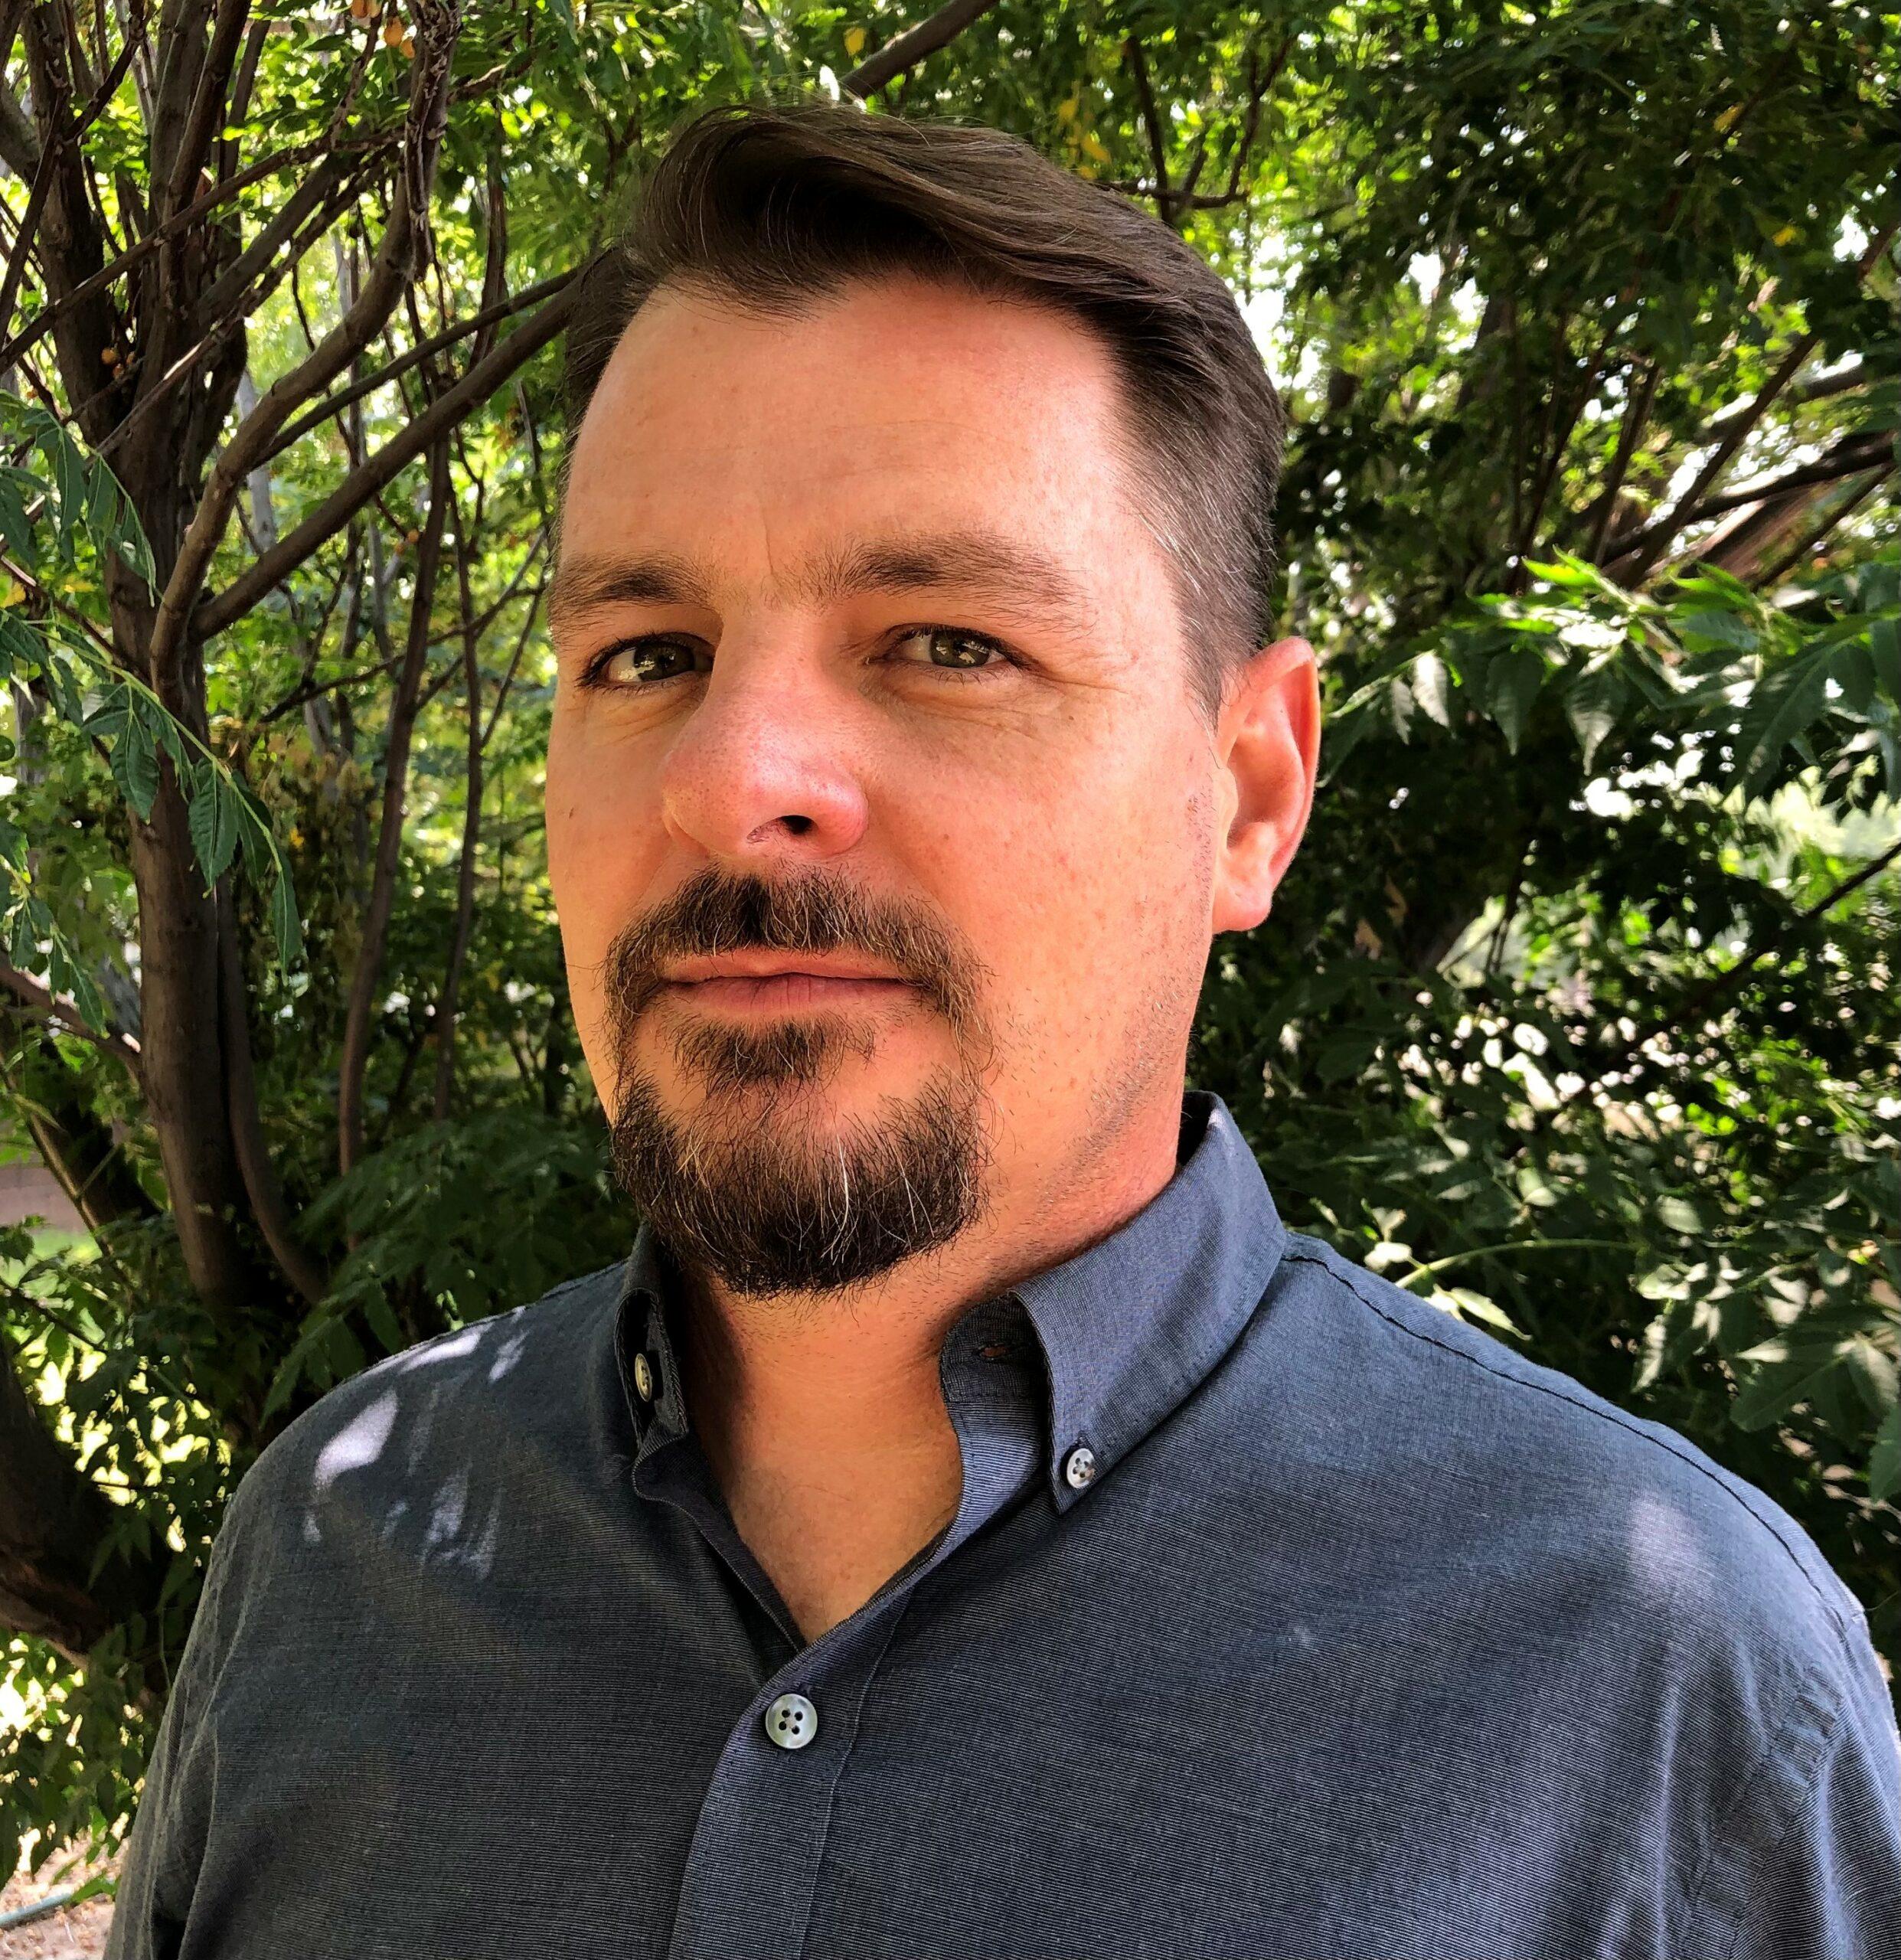 Tanner Schaub, PhD